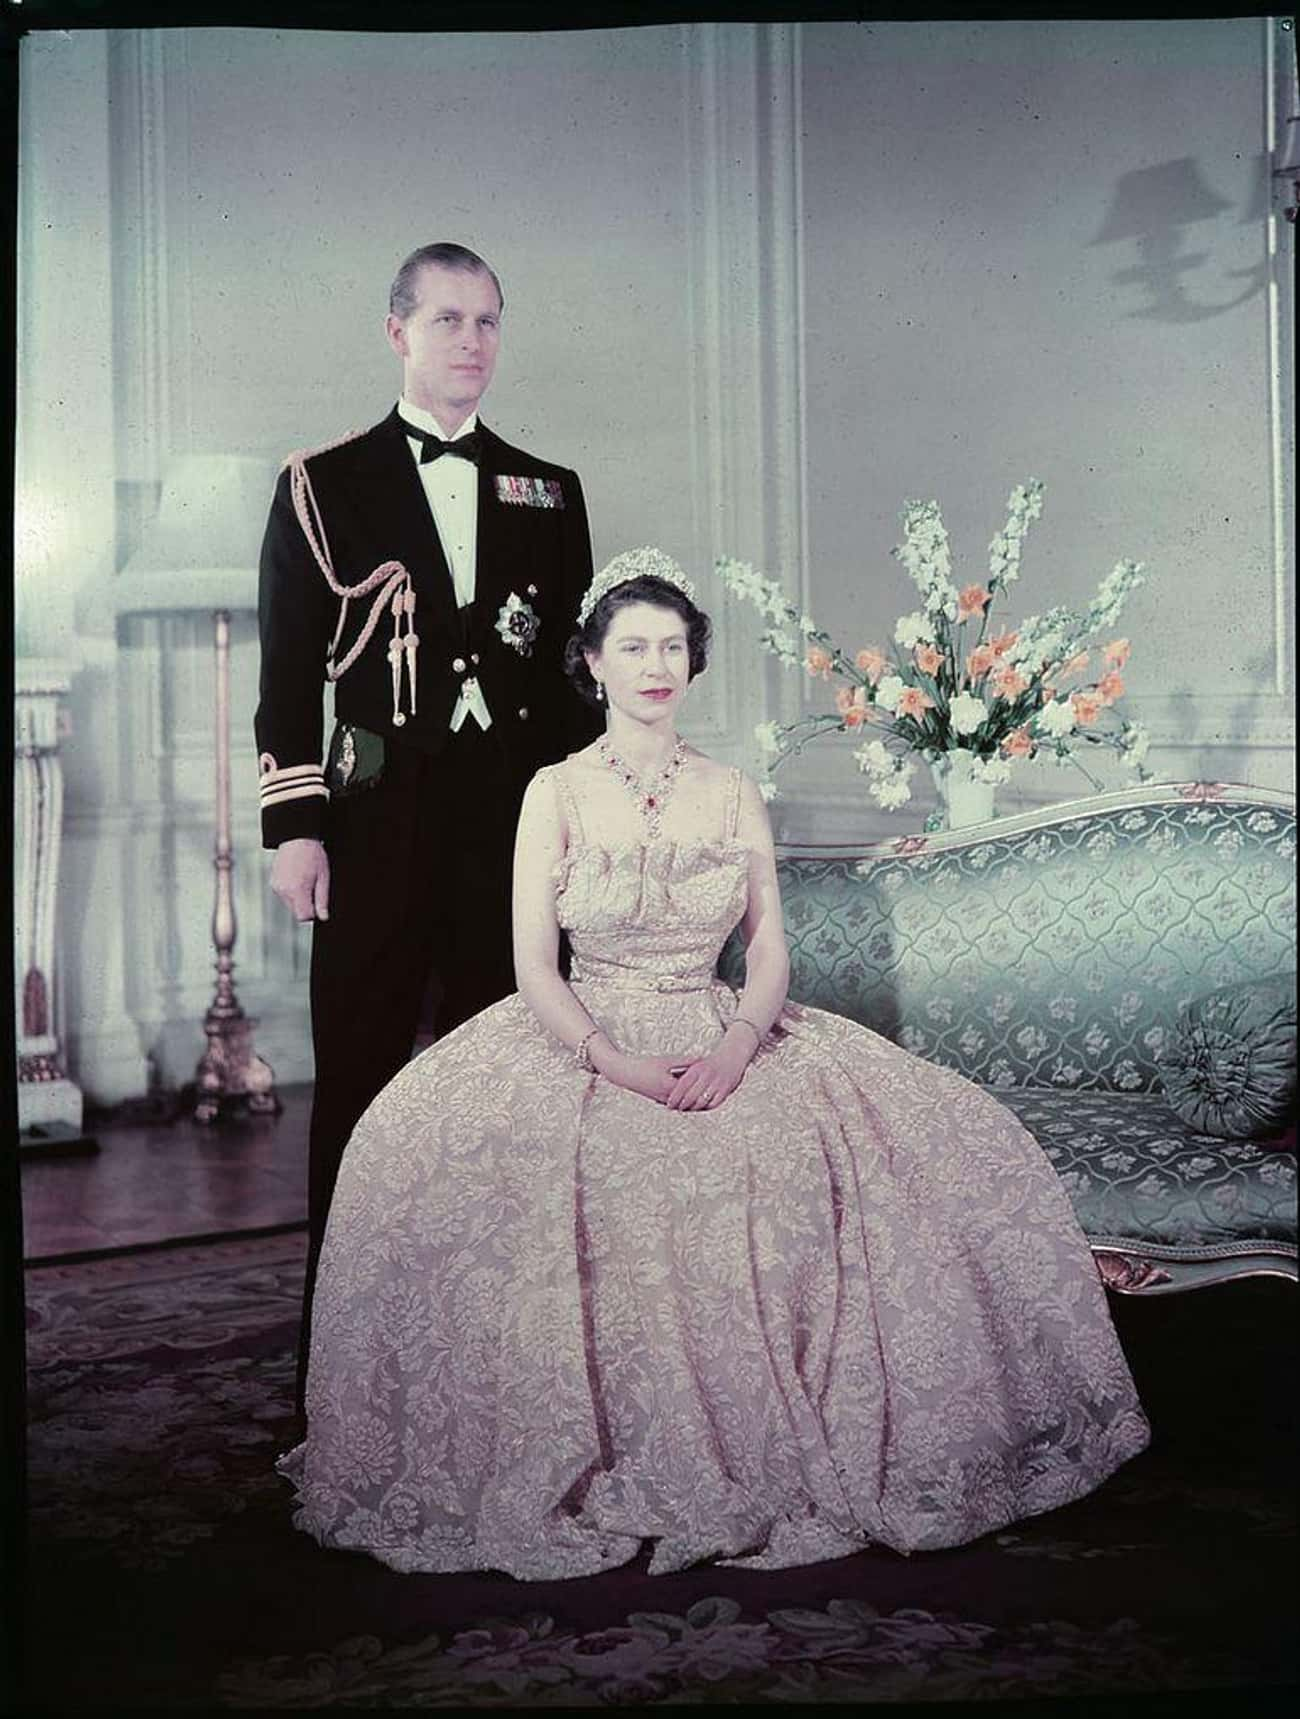 Queen Elizabeth Didn't Want Prince Philip To Testify In Divorce Proceedings